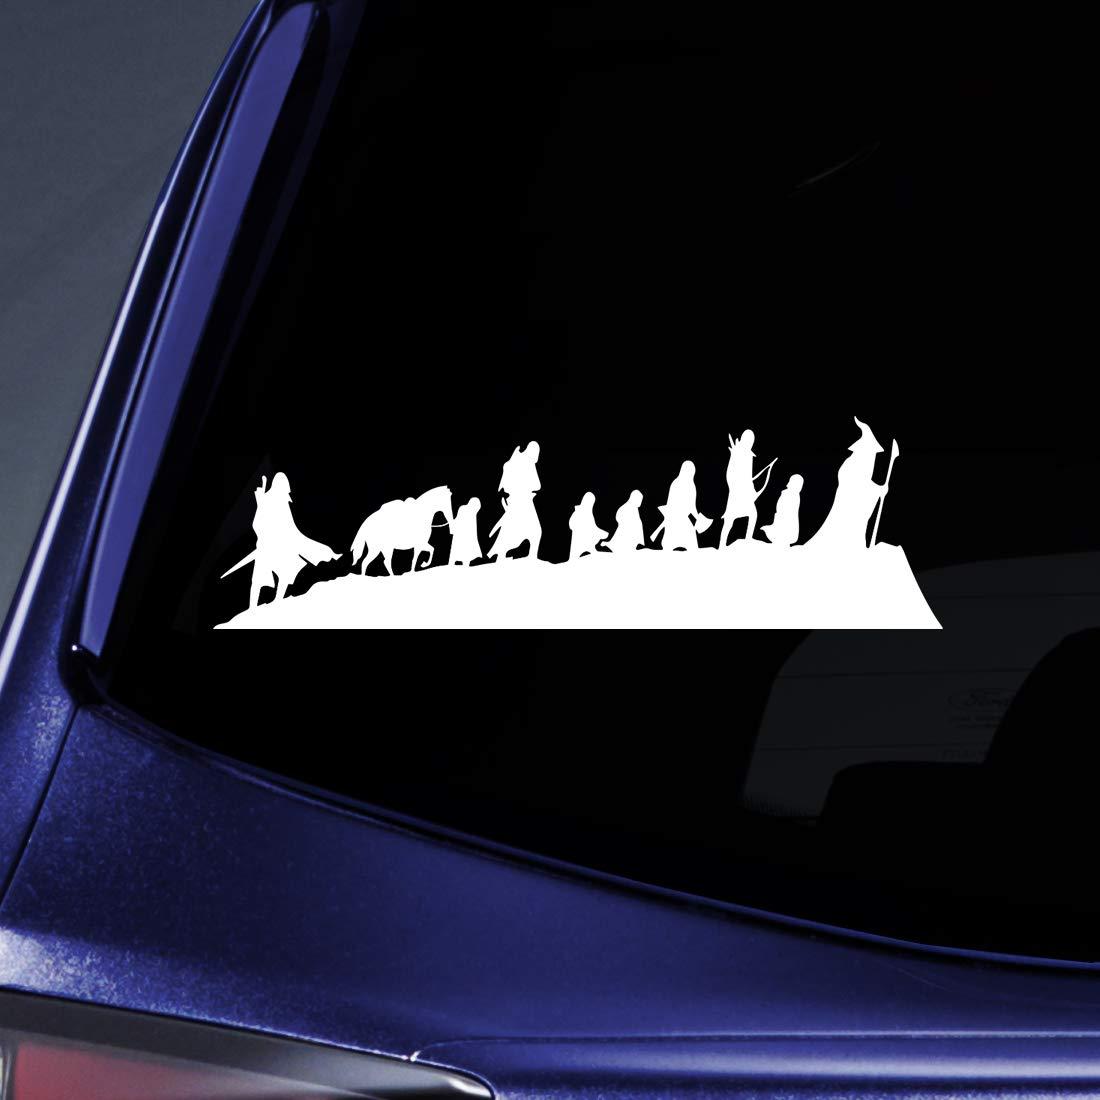 Bargain Max Decals - LOTR Caravan Fellowship Sticker Decal Notebook Car Laptop 8' (White) BM-MPR-52